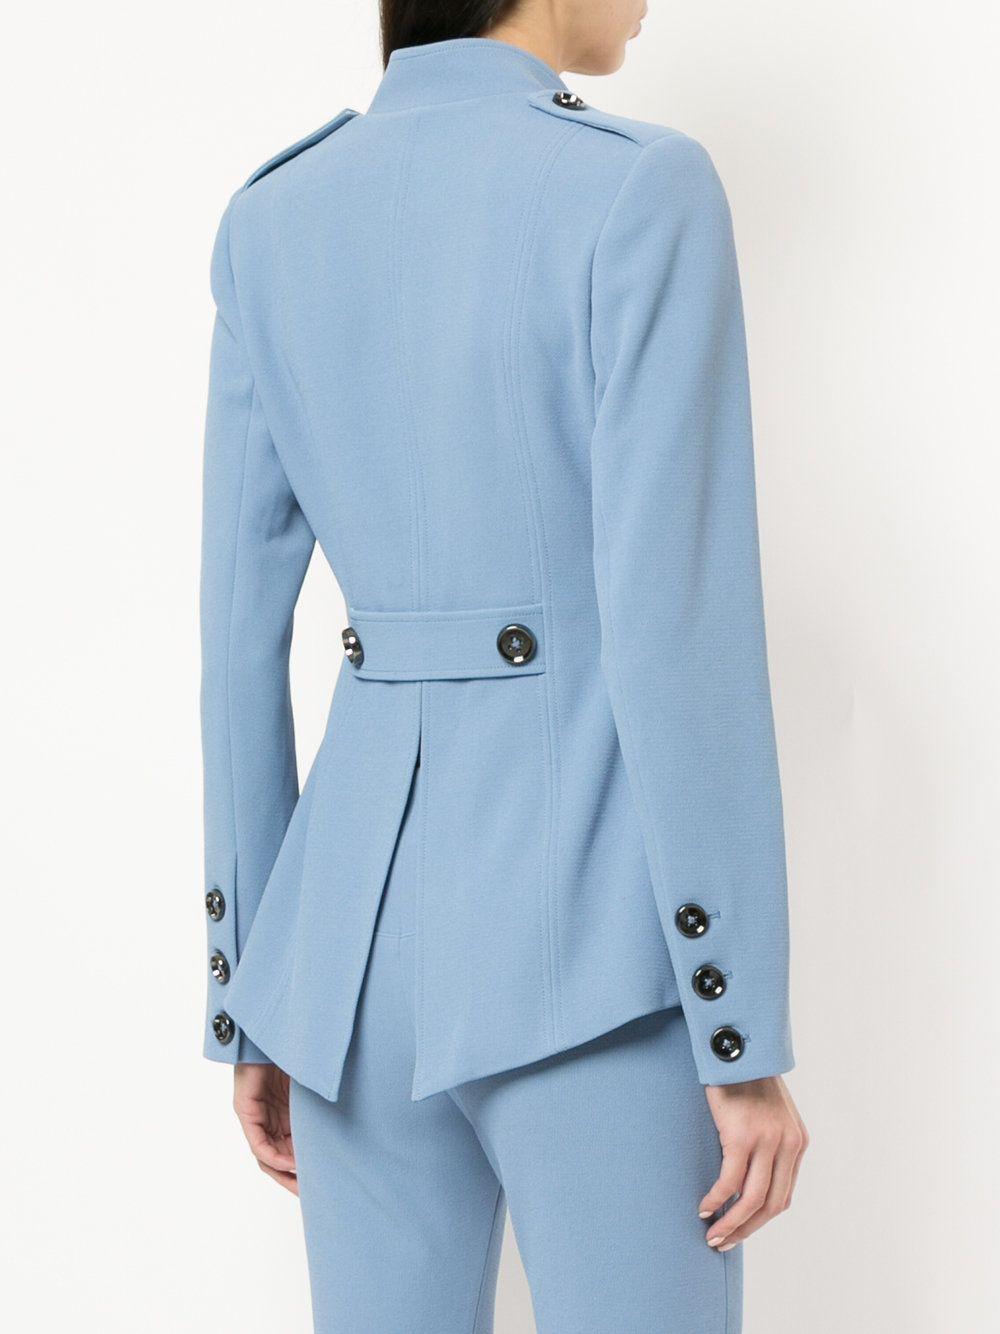 Ginger Smart Sequel Jacket Roupas Looks